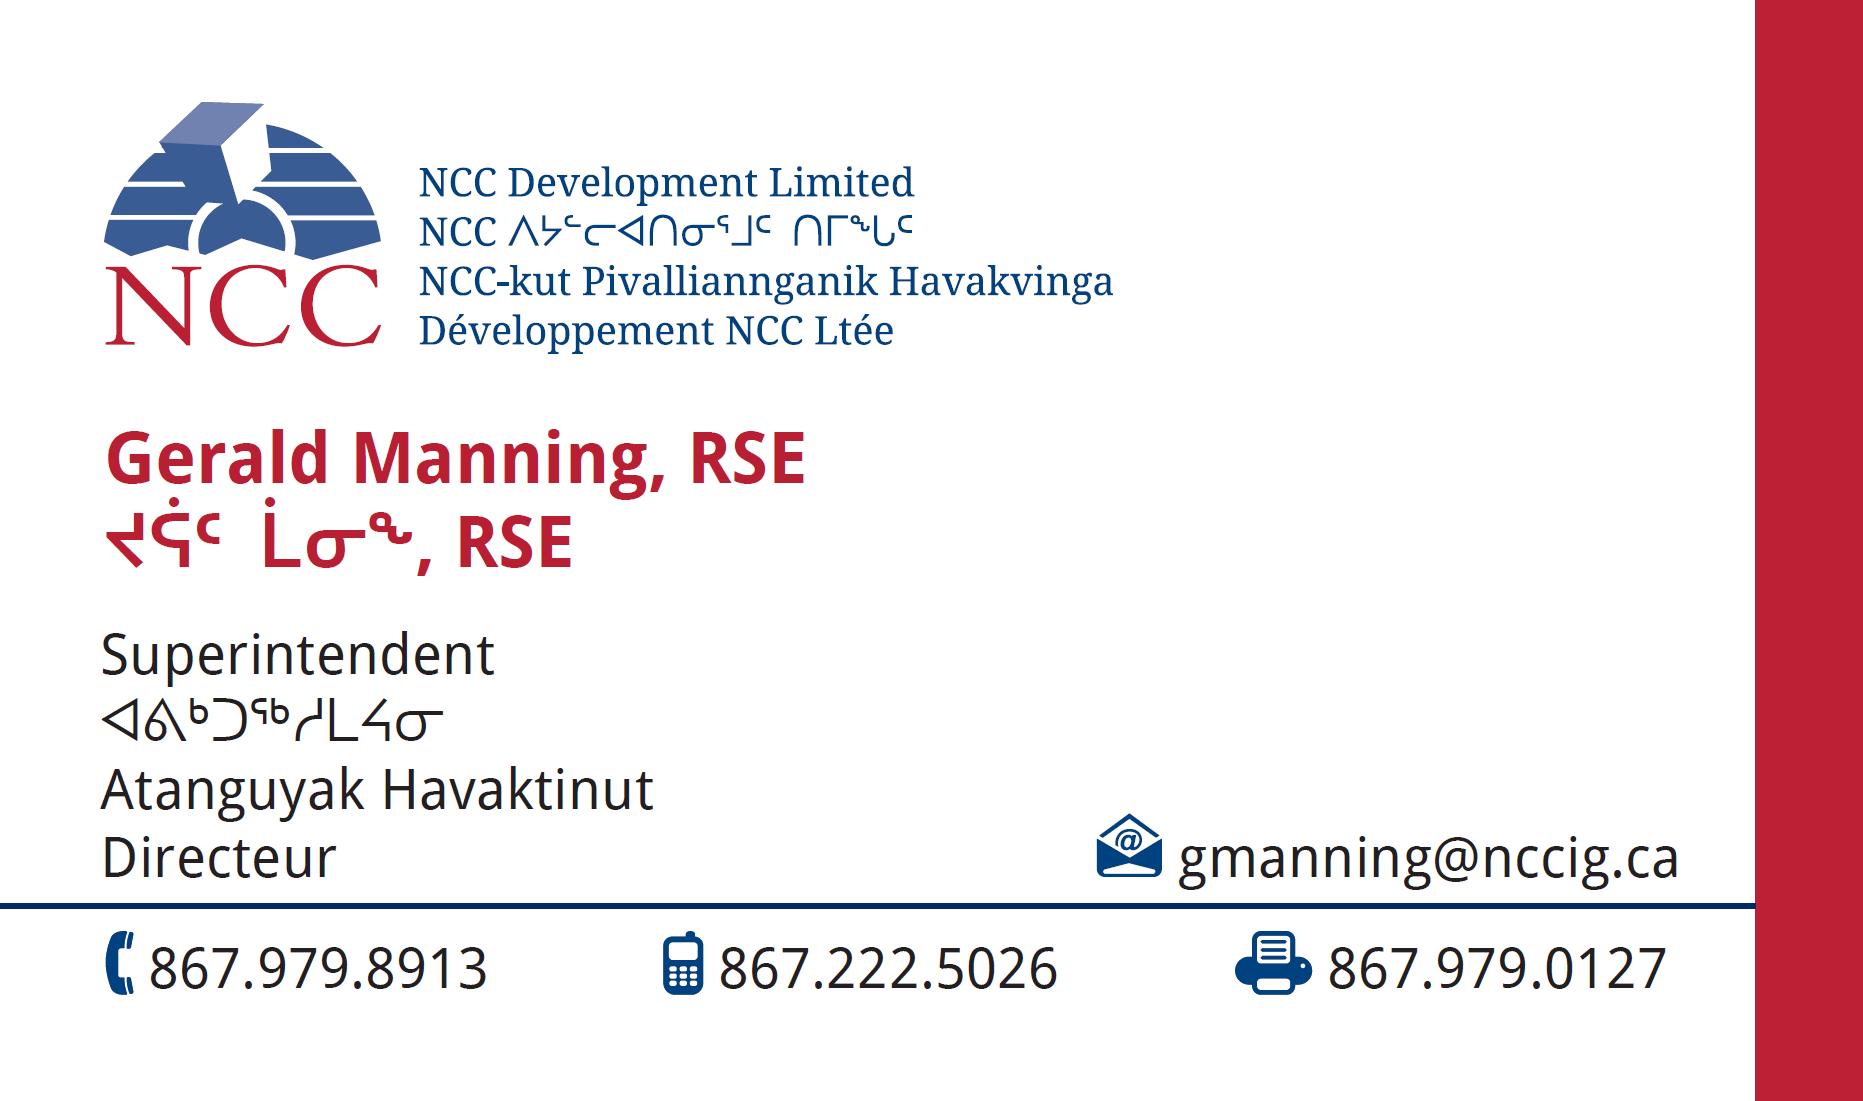 Gerald Manning - Superintendent